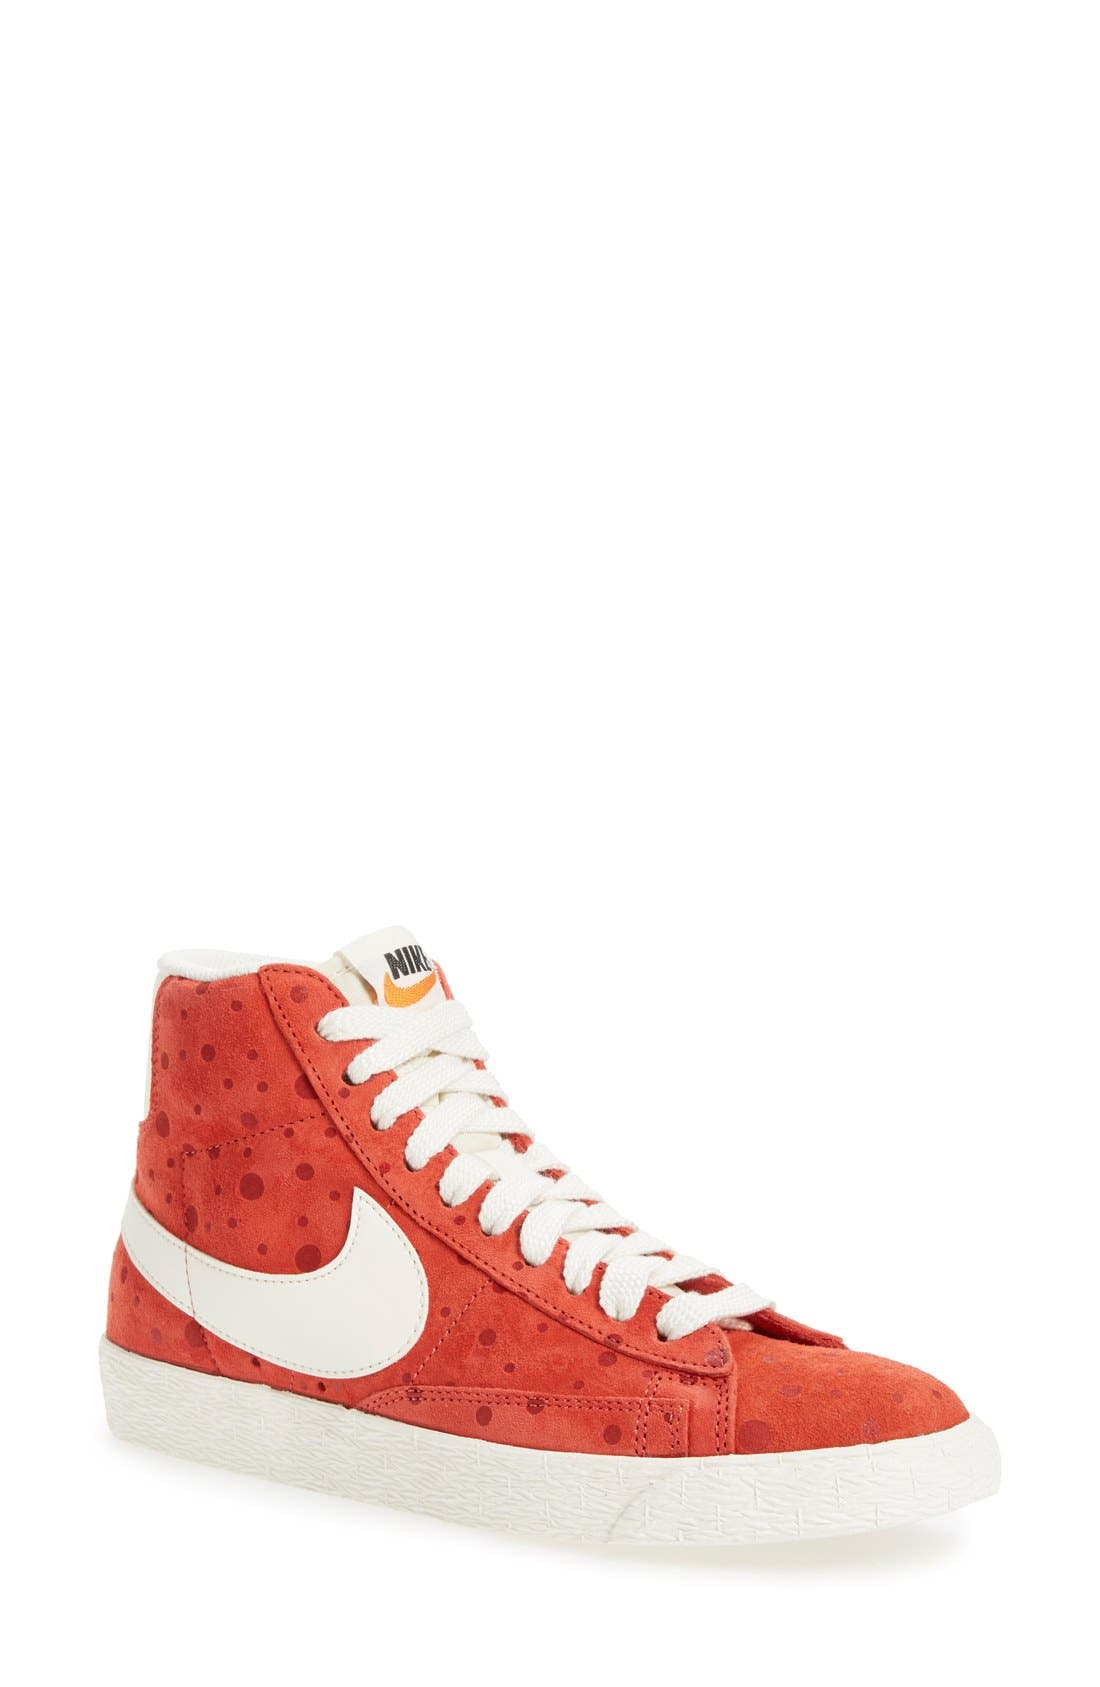 Main Image - Nike 'Blazer' Vintage High Top Basketball Sneaker (Women)